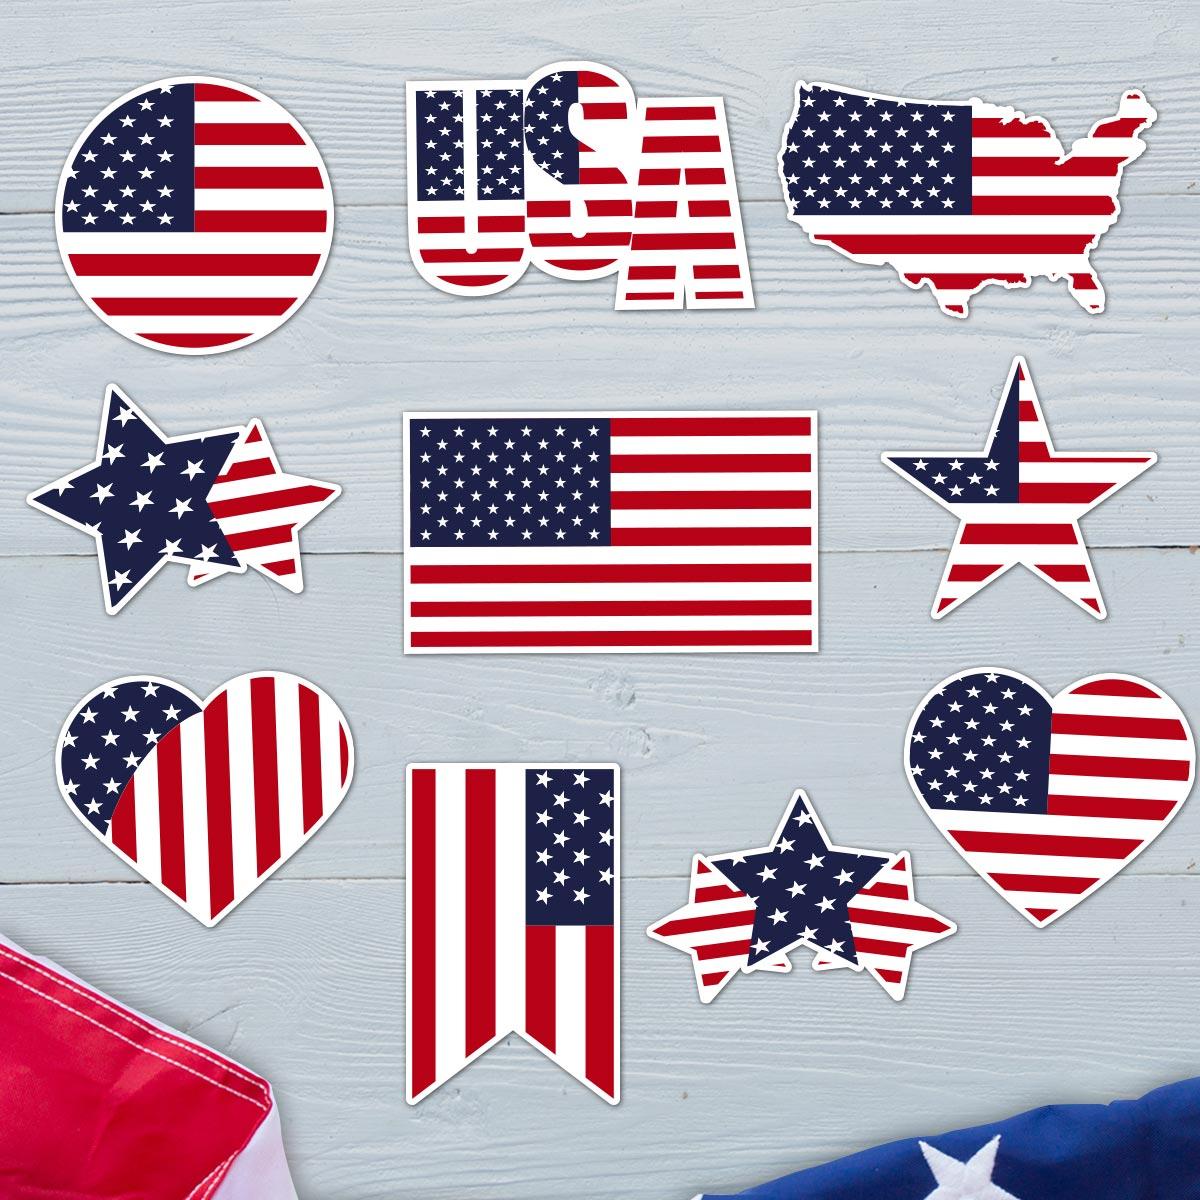 Stars and Stripes - USA Flag Sticker Bundle 1